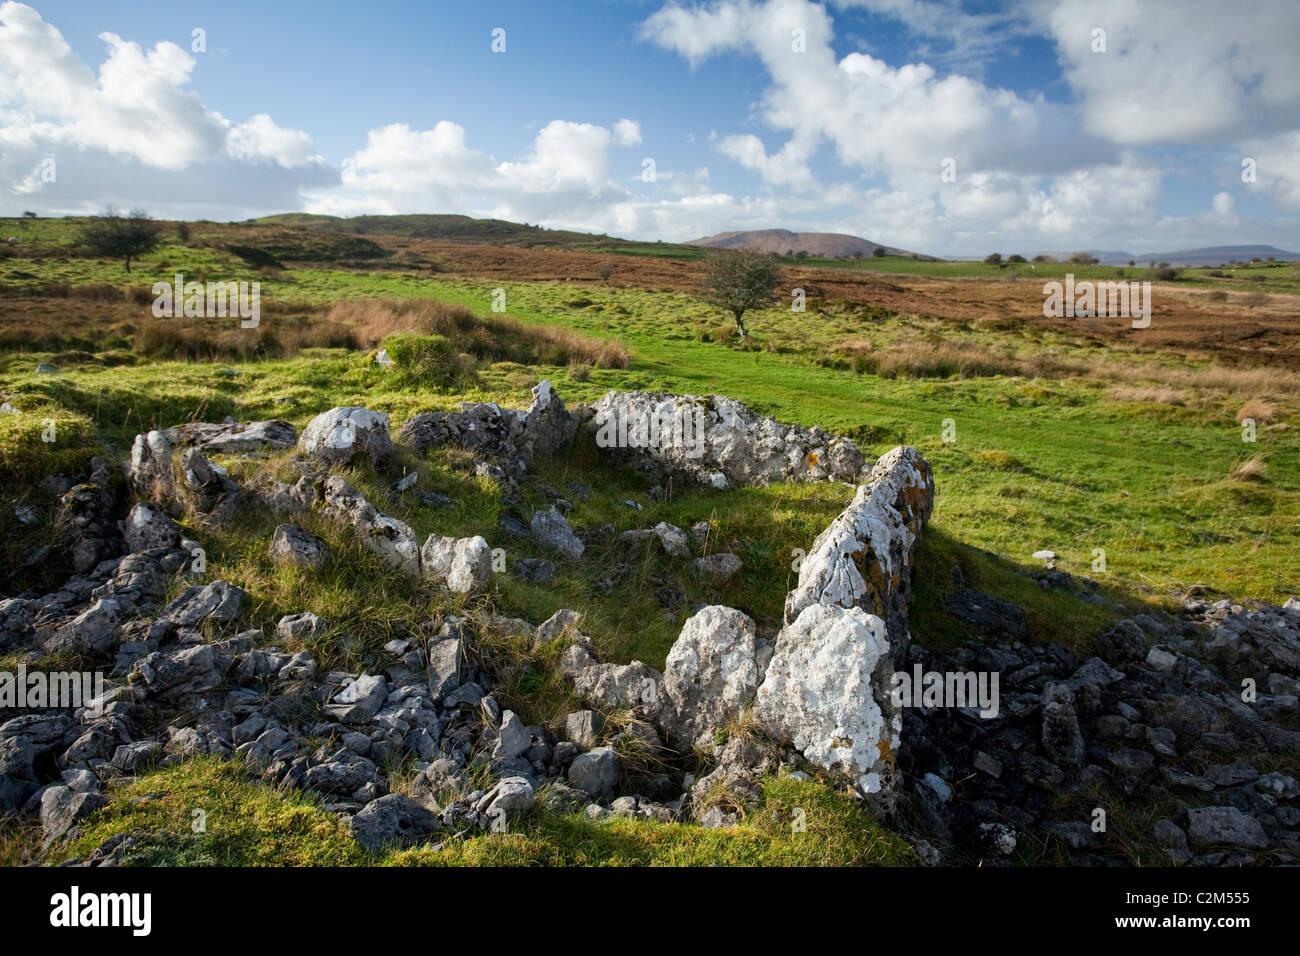 Megalithic tomb on the Tullyskeherny Loop walk, County Leitrim, Ireland. - Stock Image